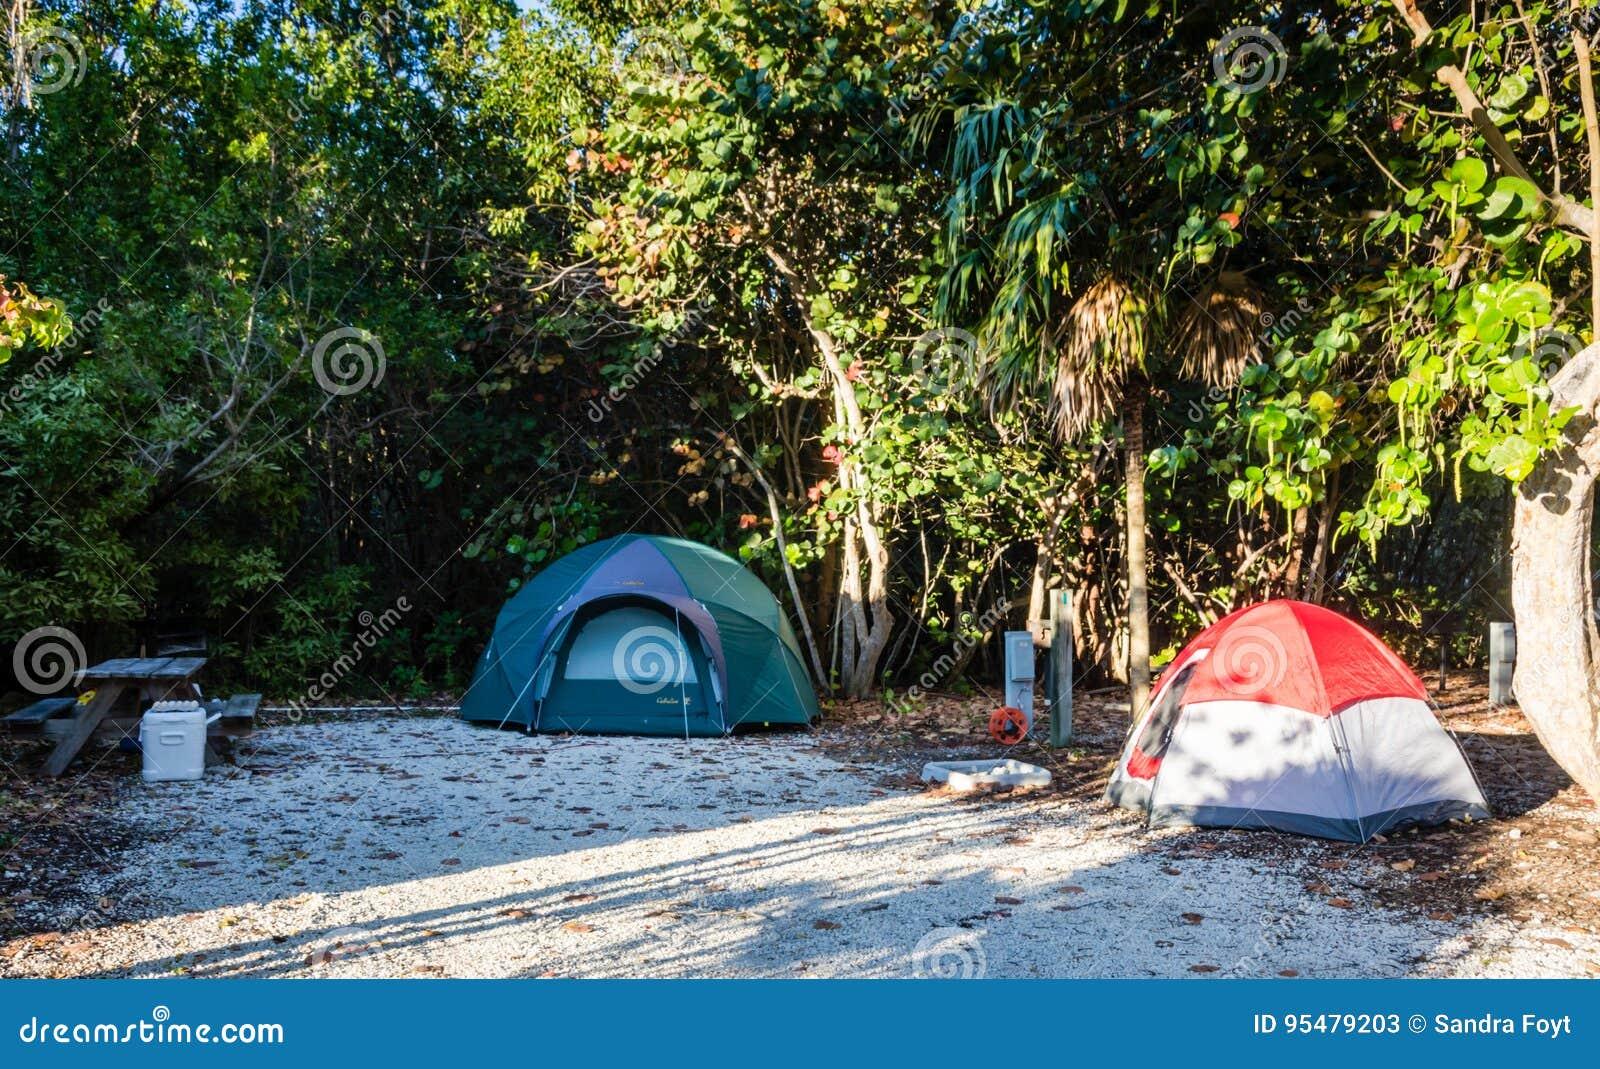 Campsite - John Pennekamp rafy koralowa stanu park - Floryda